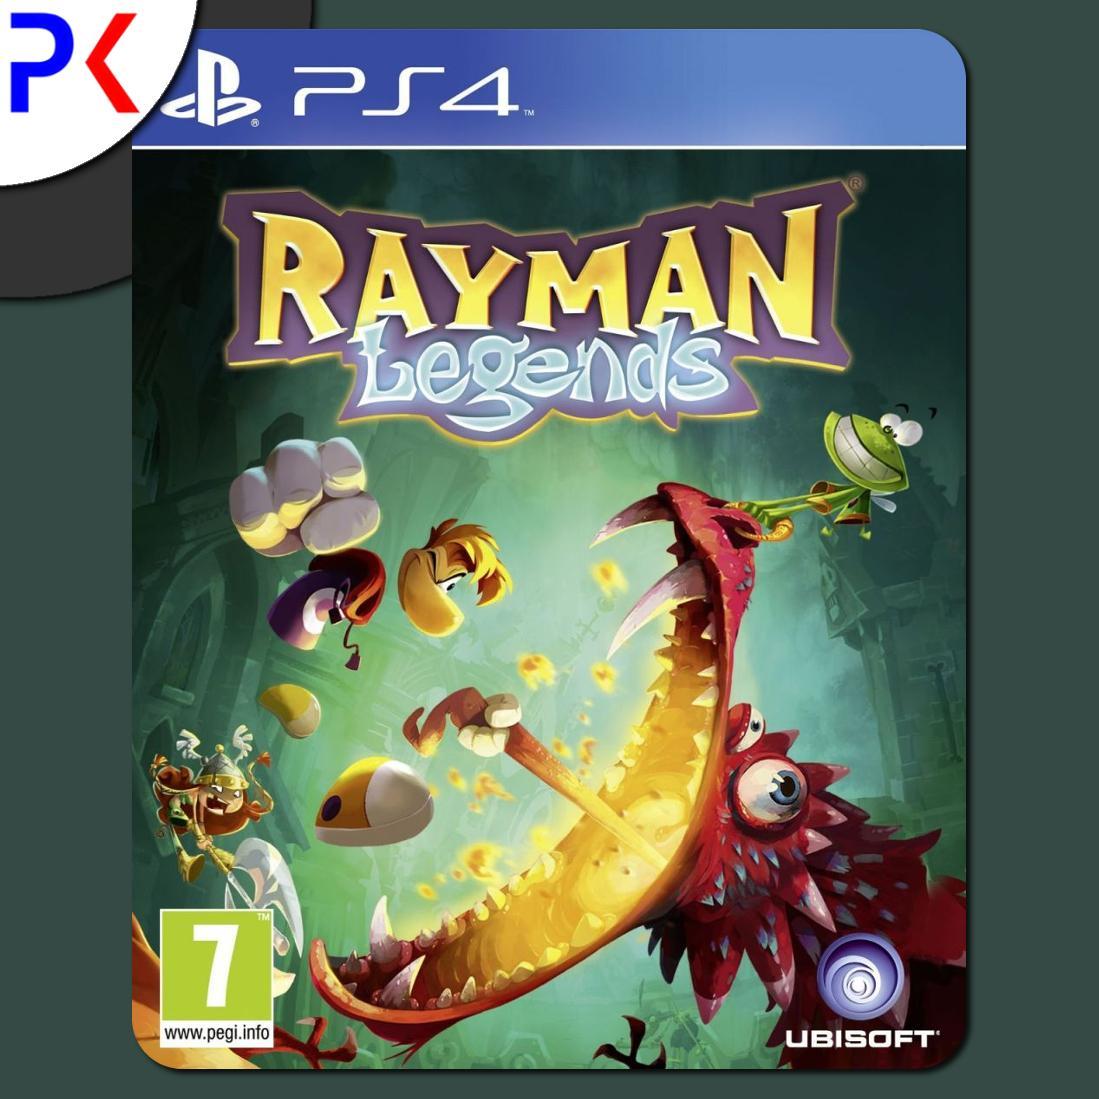 PS4 Rayman Legends (R2)